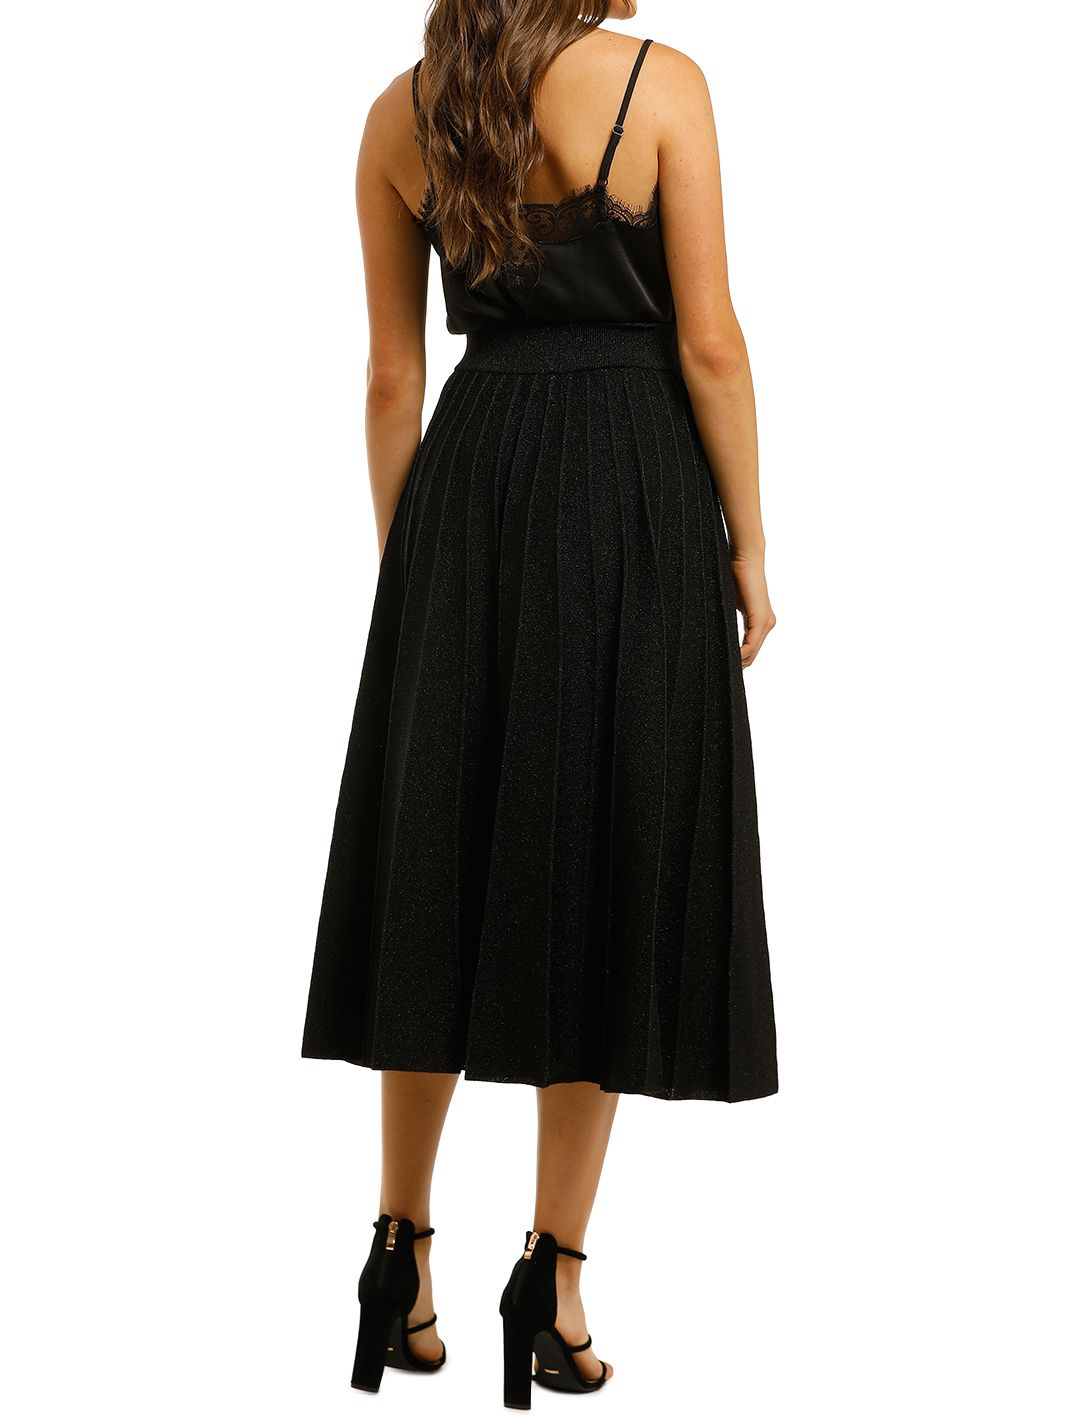 Vestire-Just-A-Little-Crush-Midi-Skirt-Black-Back